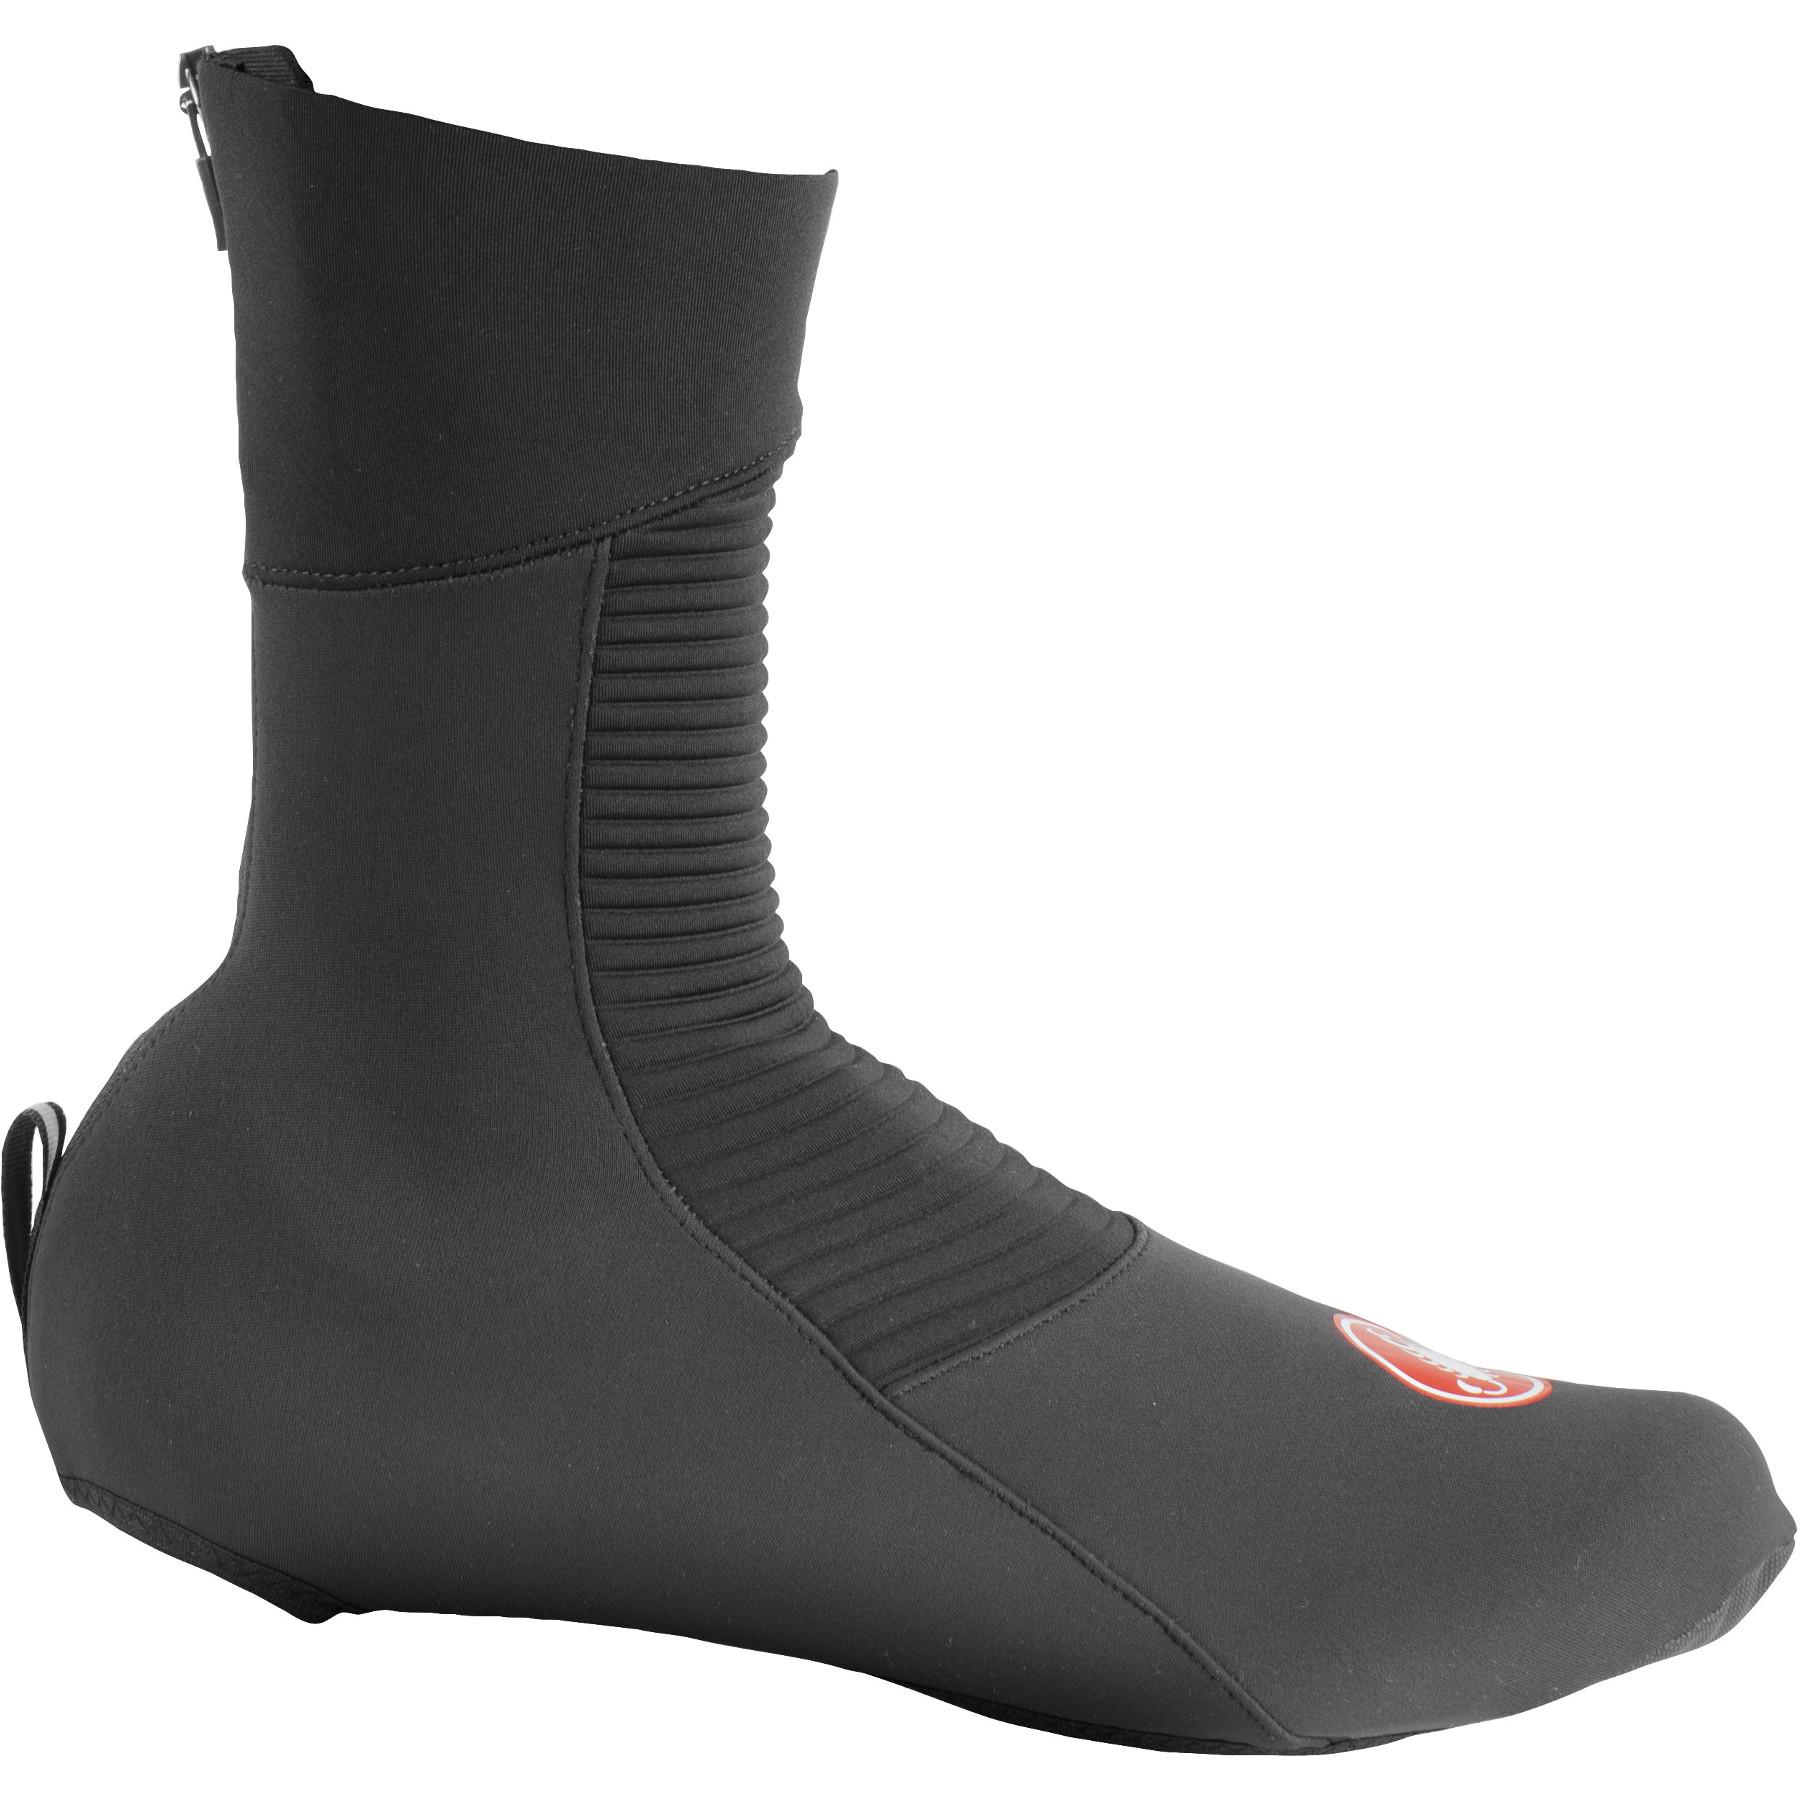 Image of Castelli Entrata Shoecover - black 010